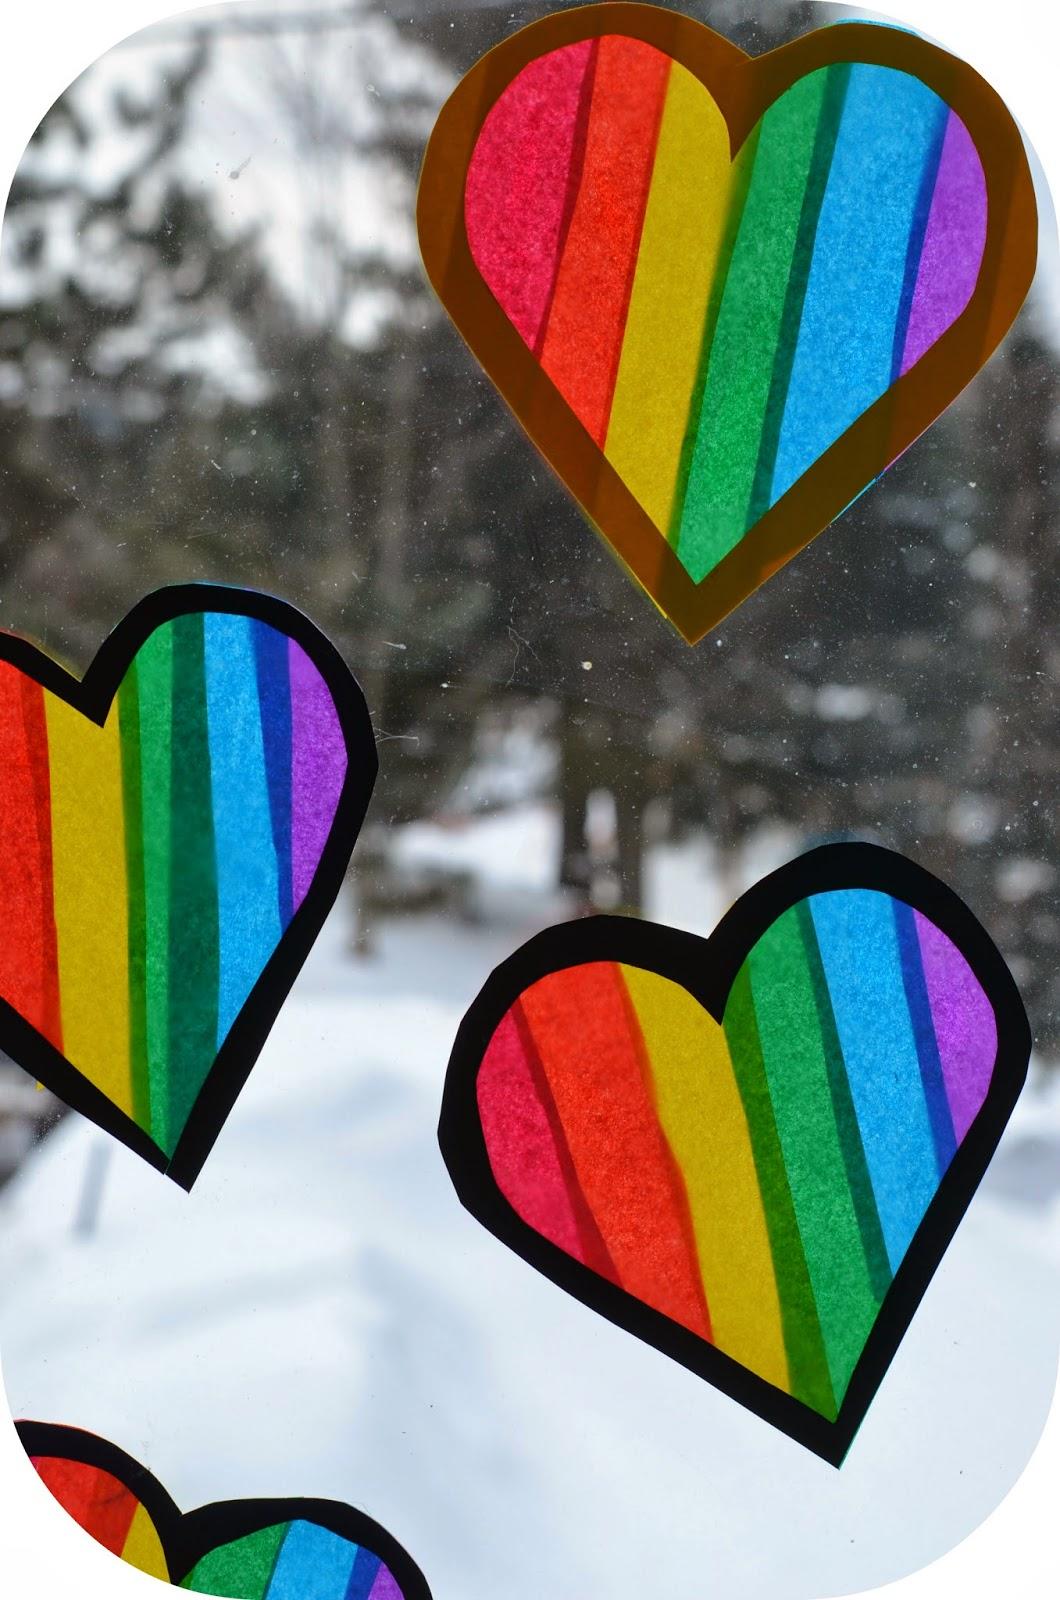 Twig And Toadstool Rainbow Heart Transparencies